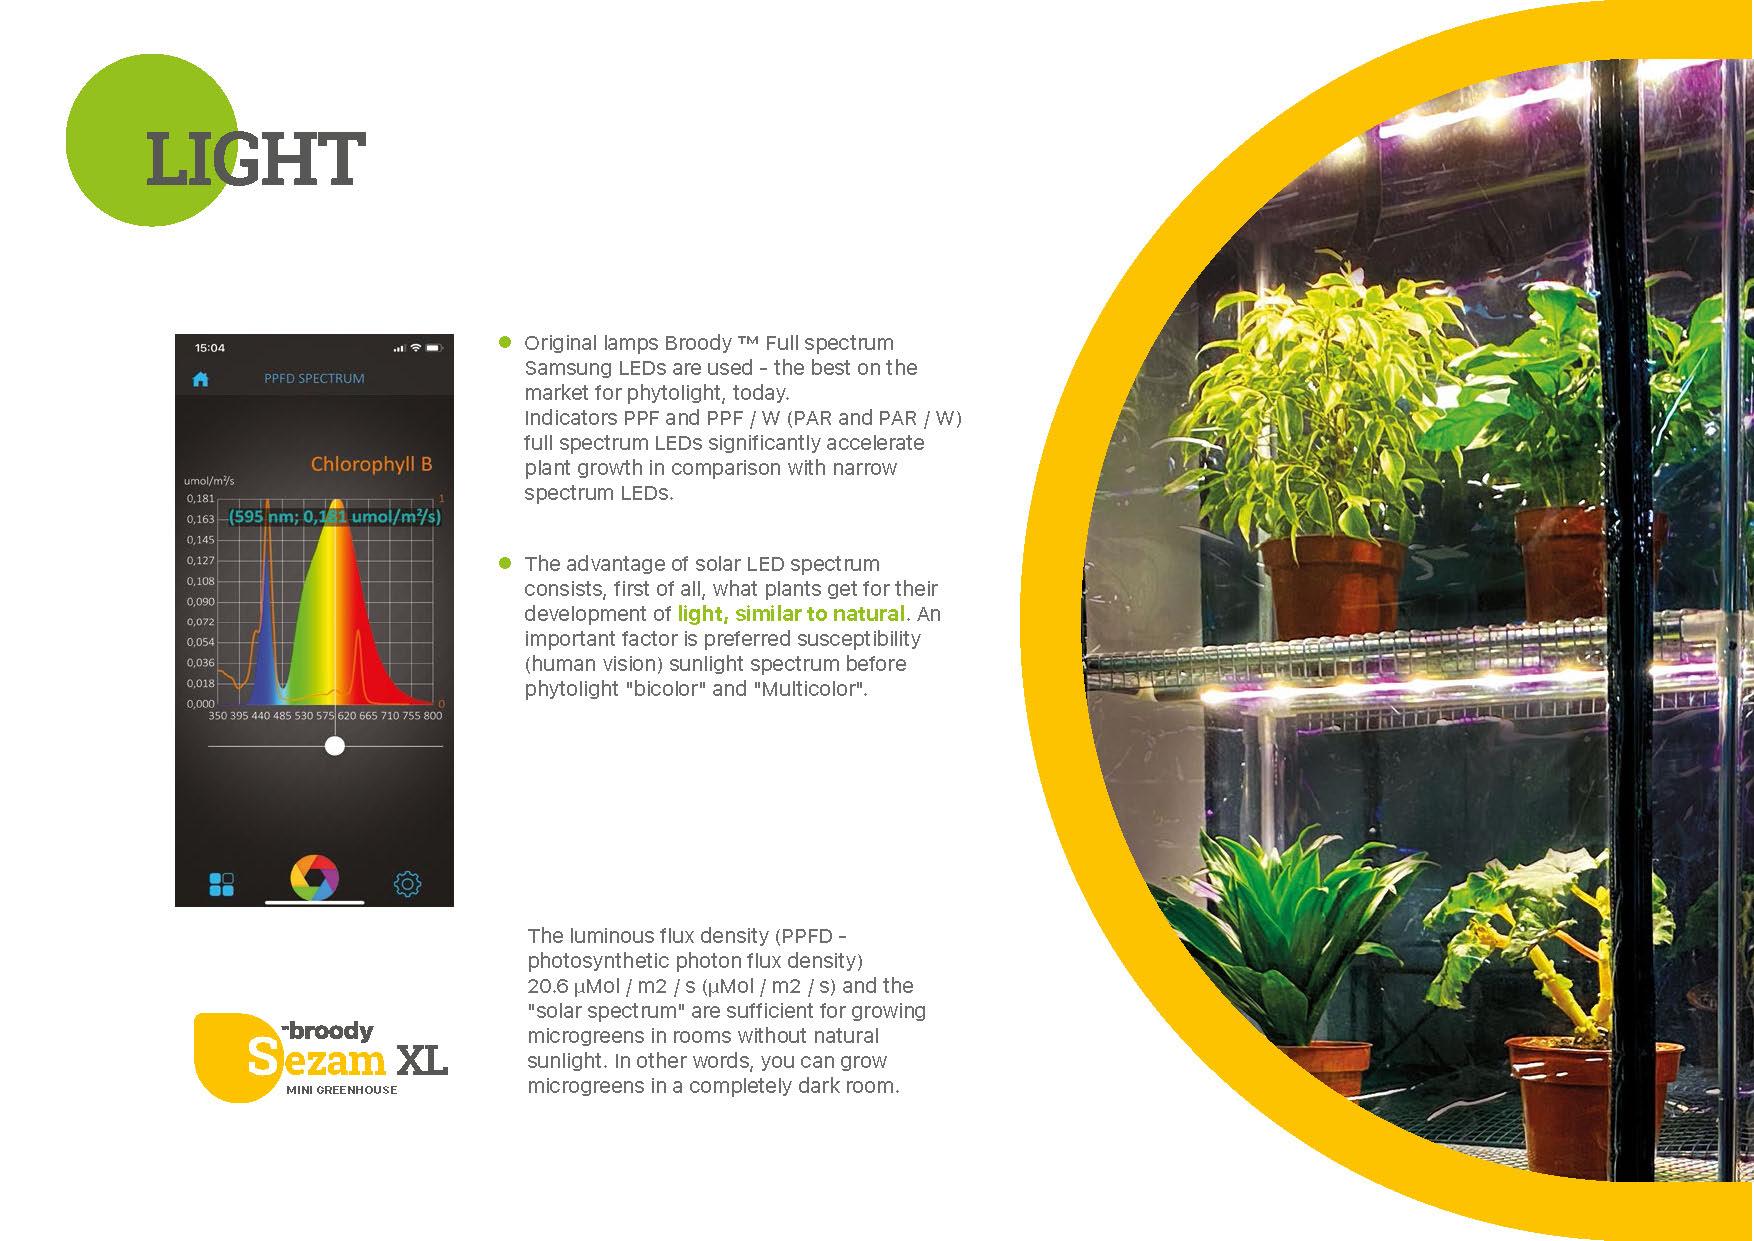 Sezam_XL_indoor_greenhouse_system_03